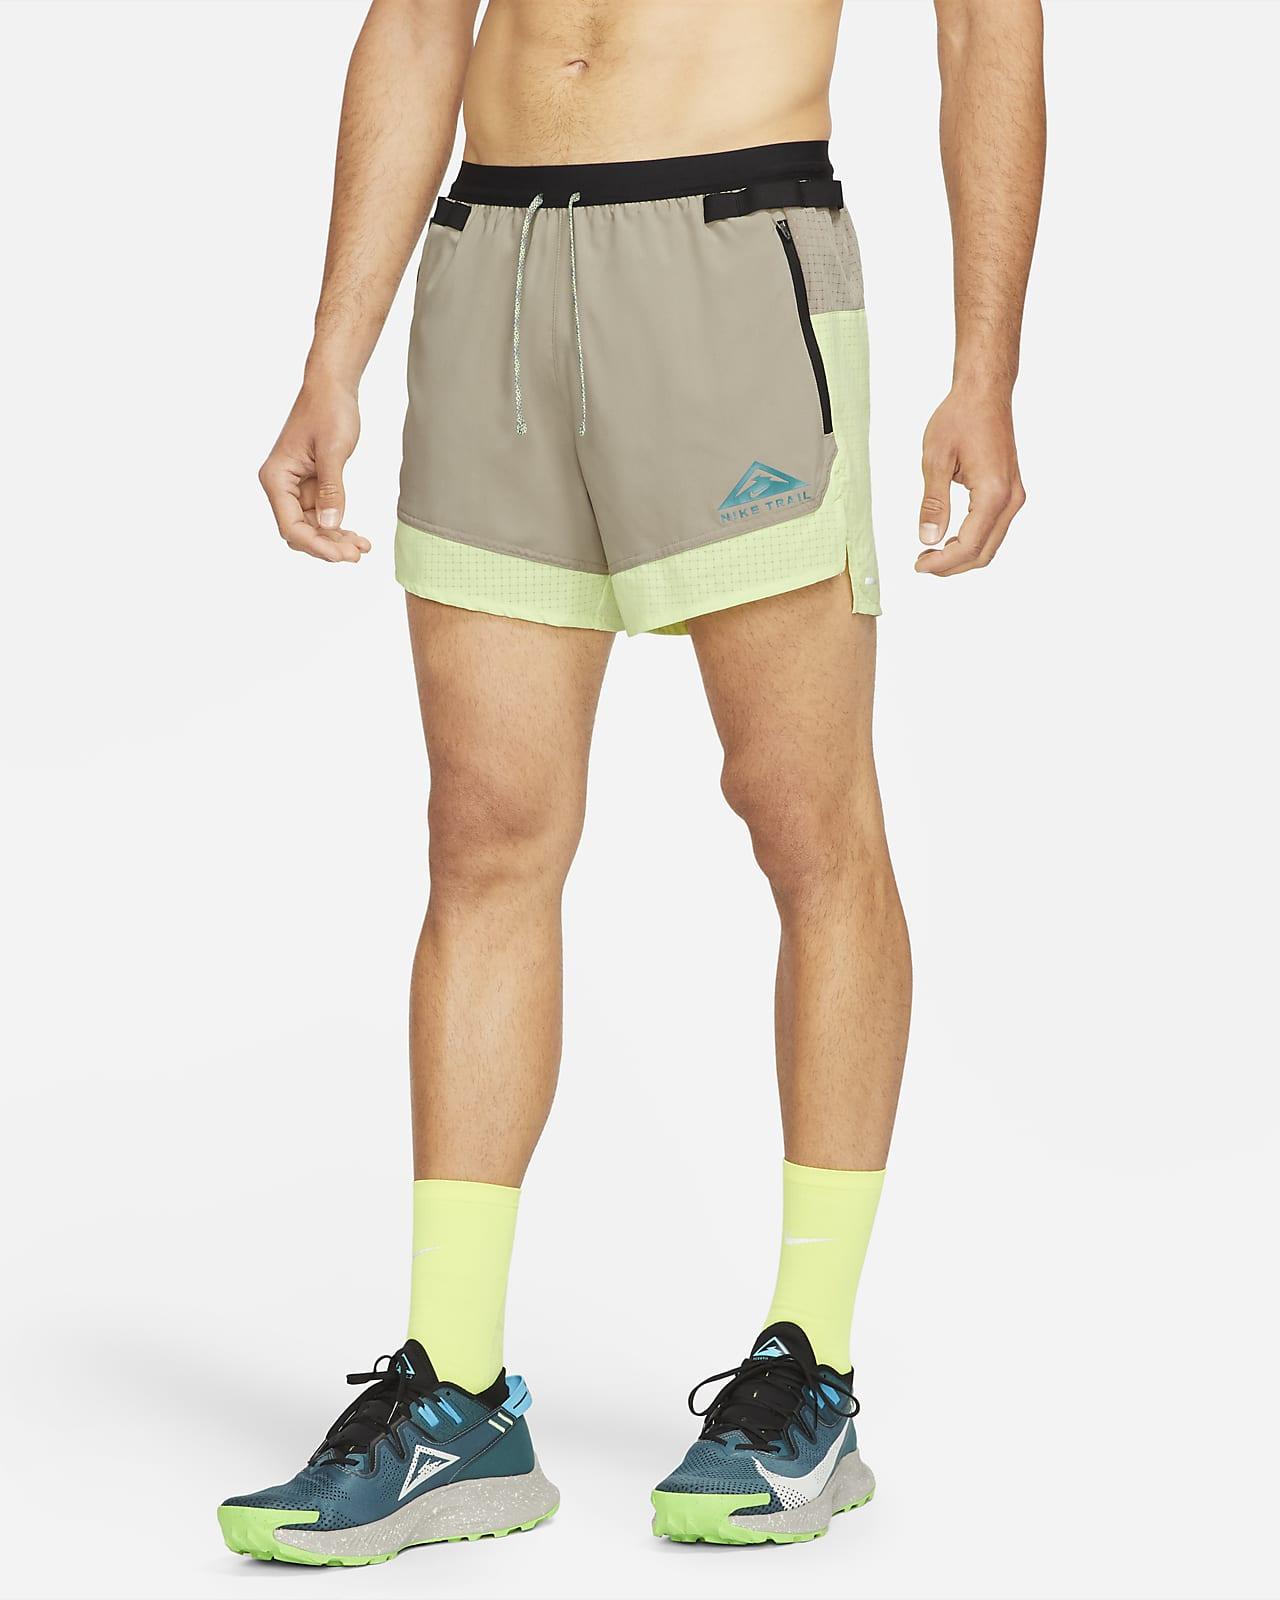 Nike Dri-FIT Flex Stride Arazi Tipi Erkek Şortu